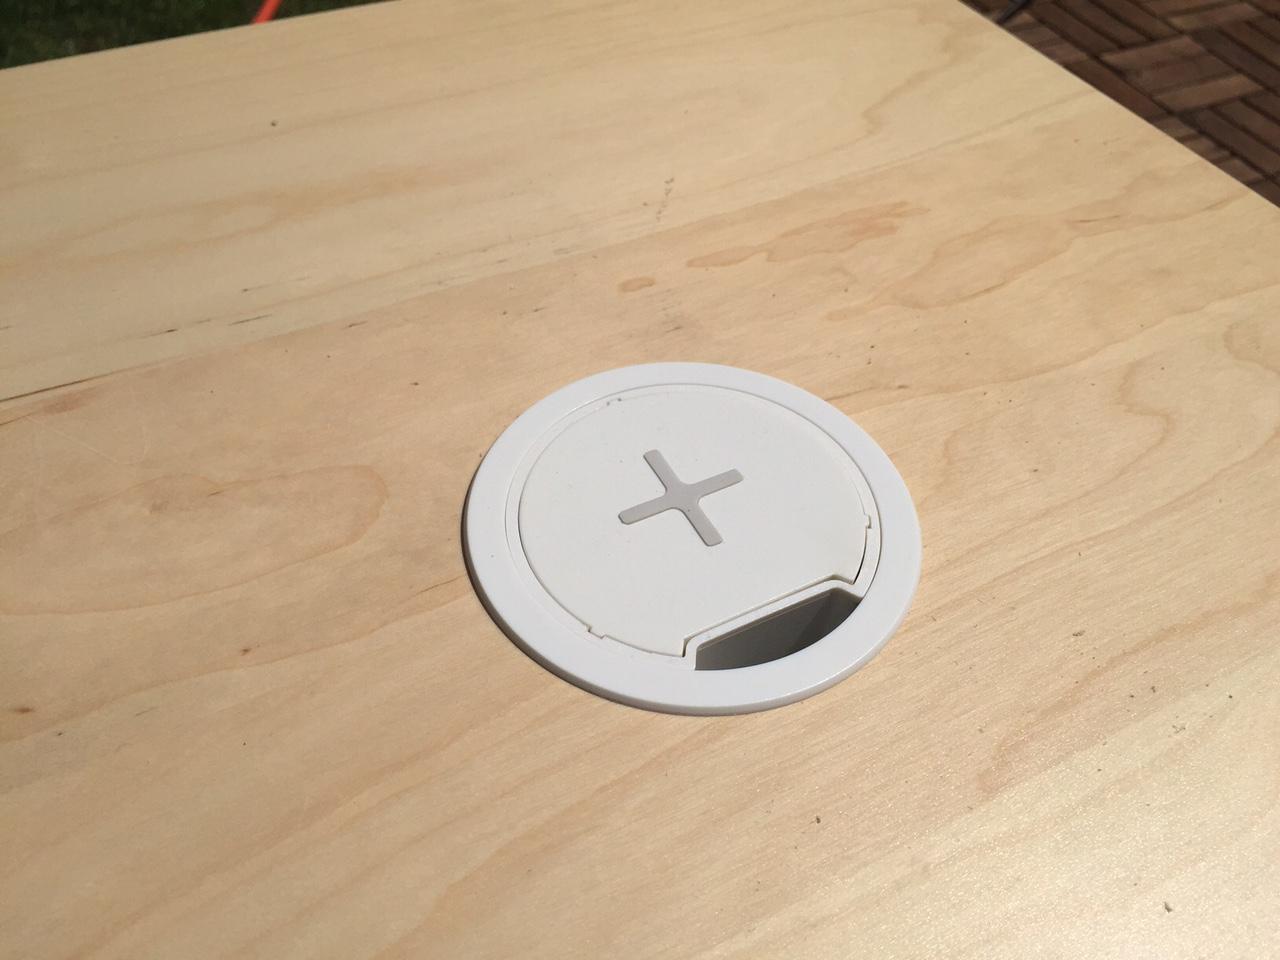 Ikea Mobel Mit Qi Und Selbstbaukasten Android Hardware Iphone